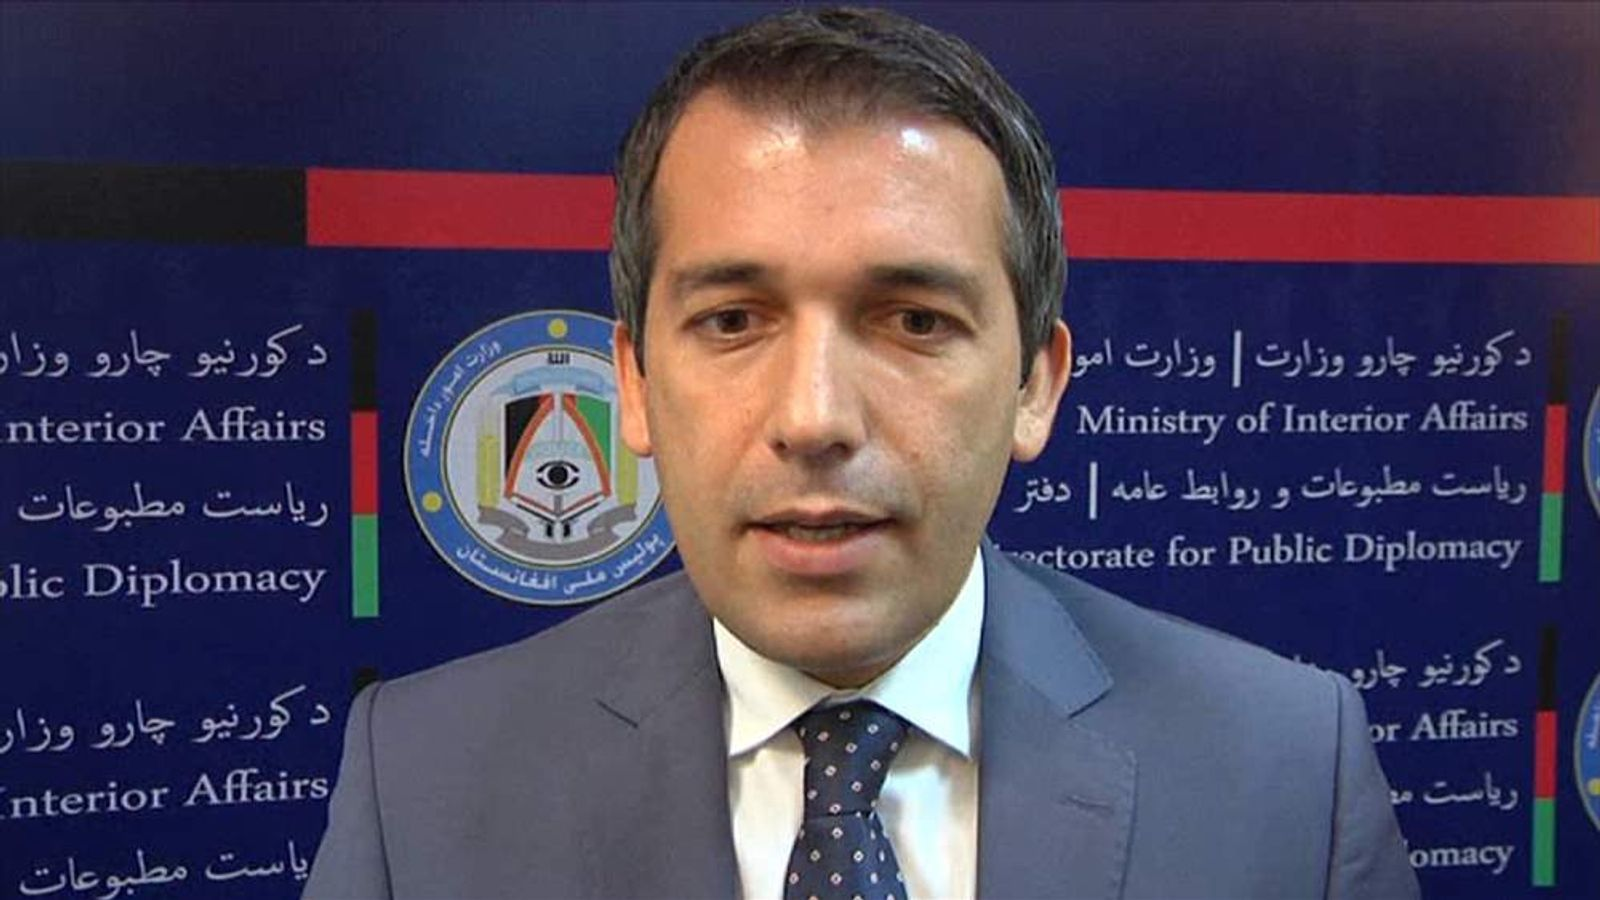 Afghan Interior Minister